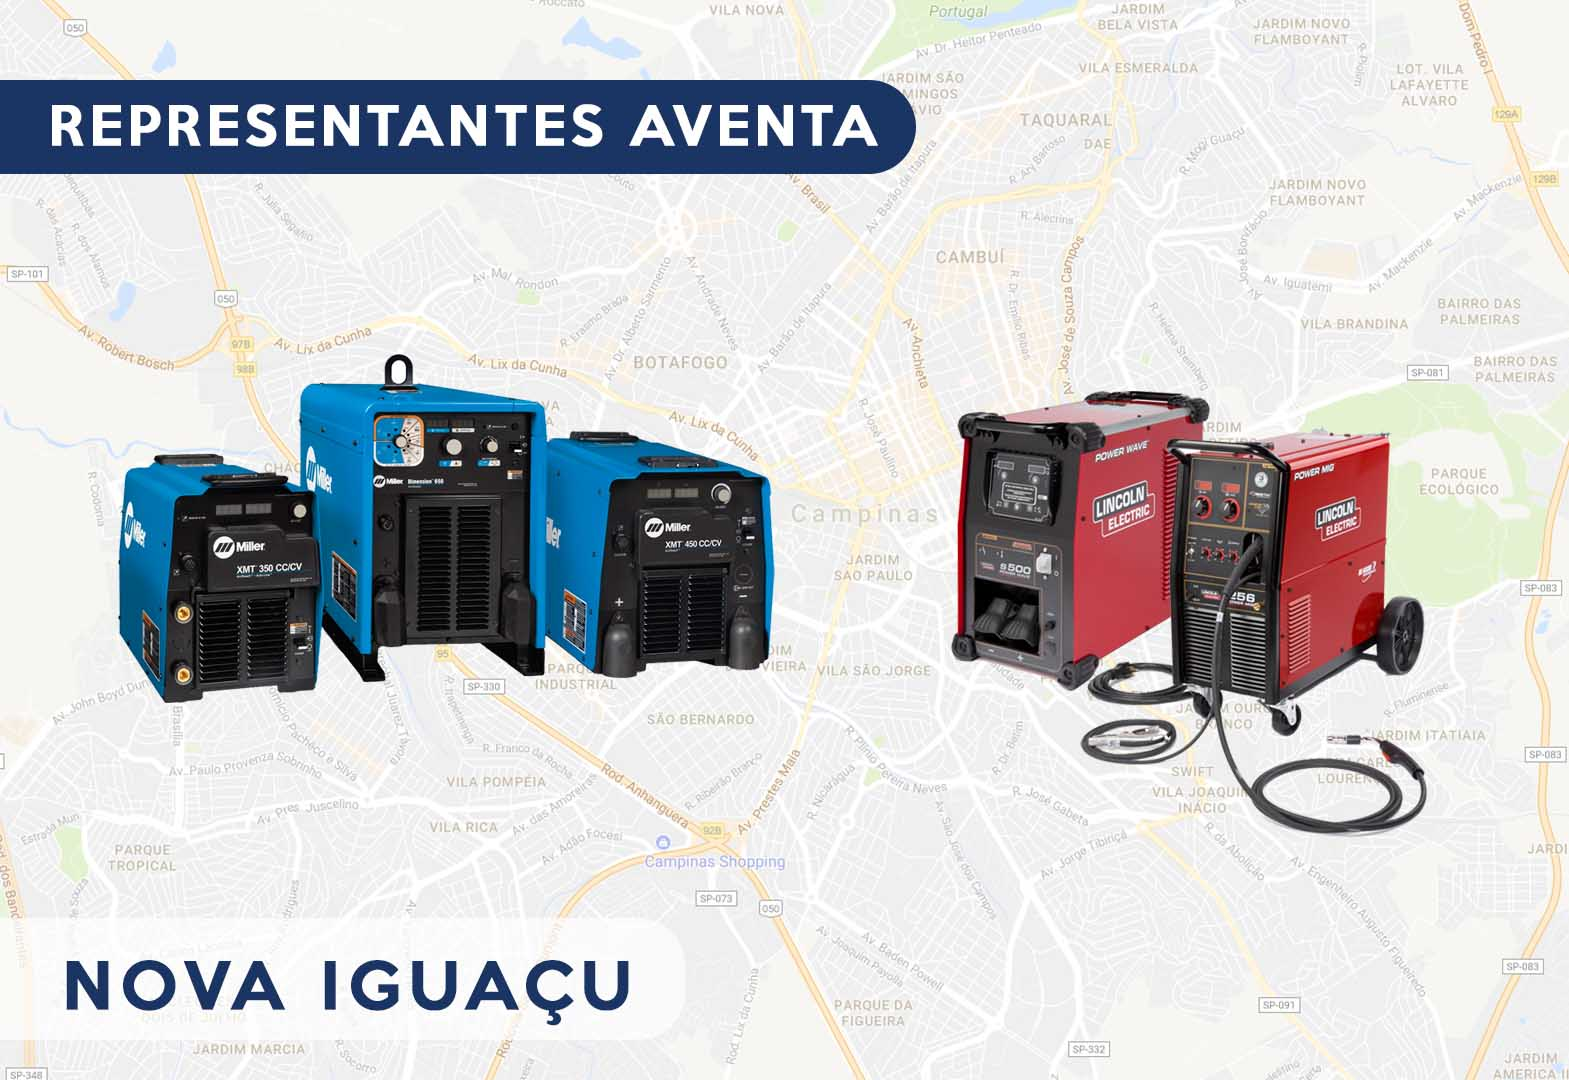 maquina solda nova iguacu